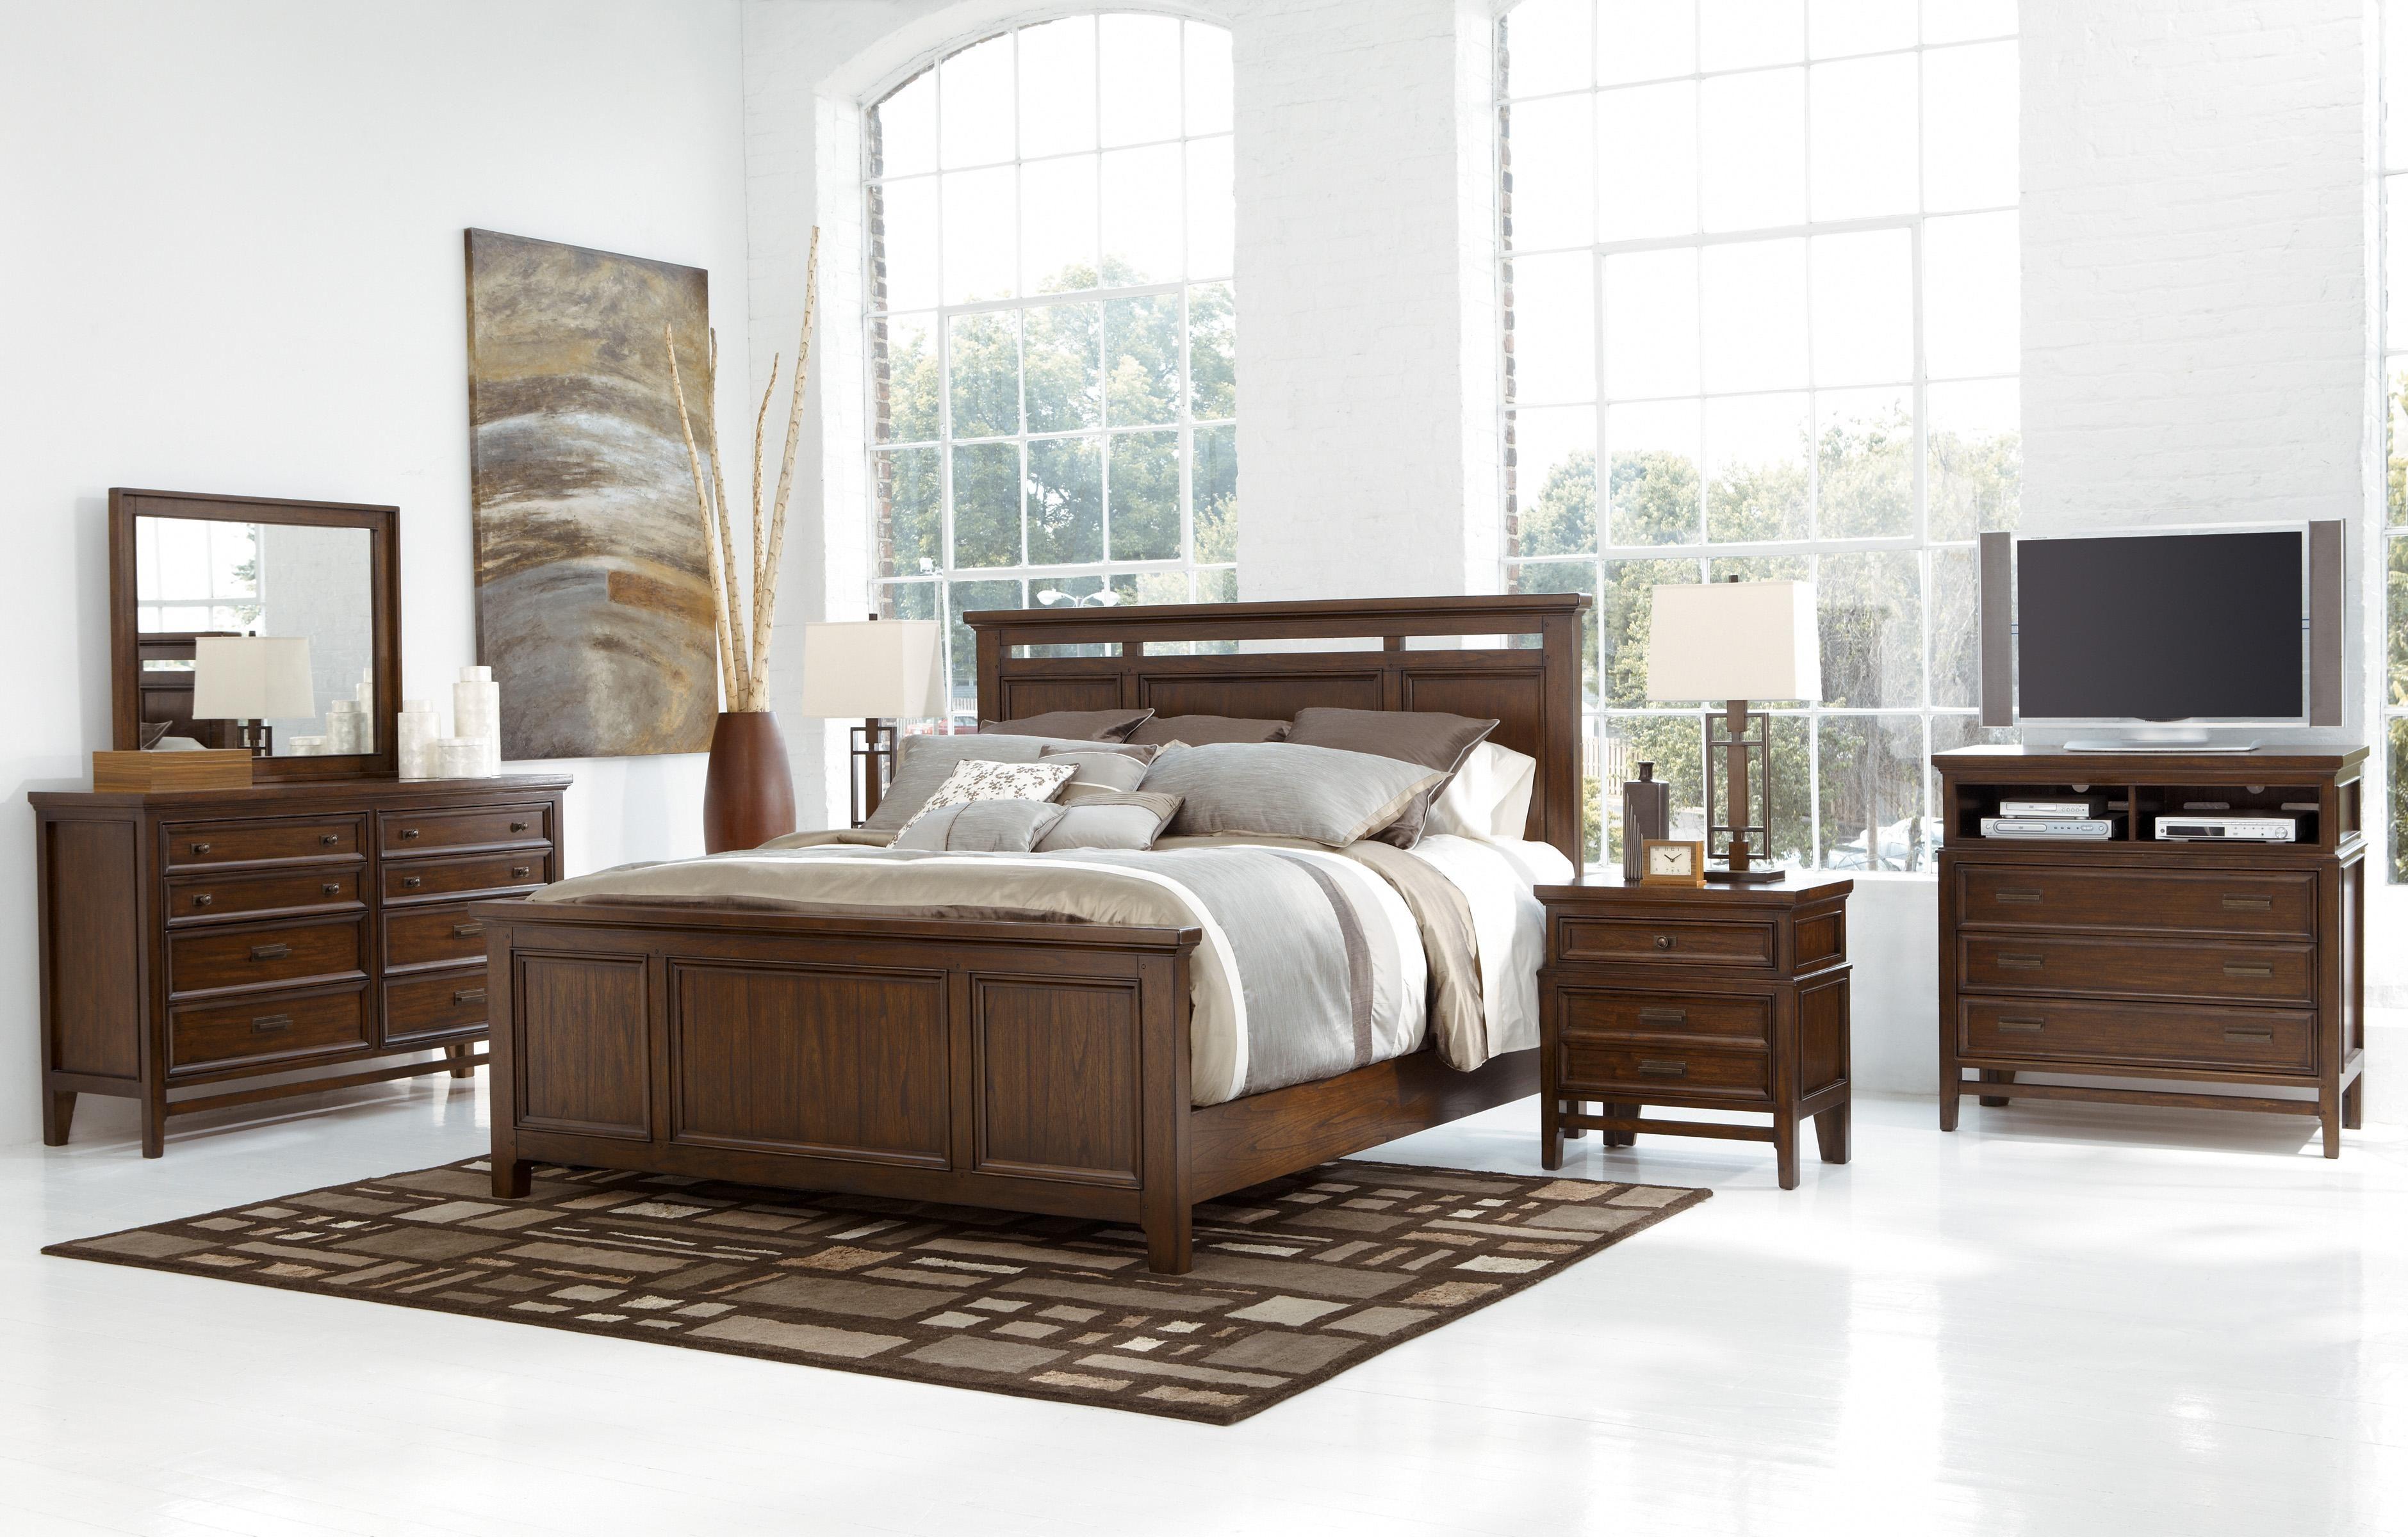 Ashley Furniture Kenwood Bedroom Set Home Sweet Home